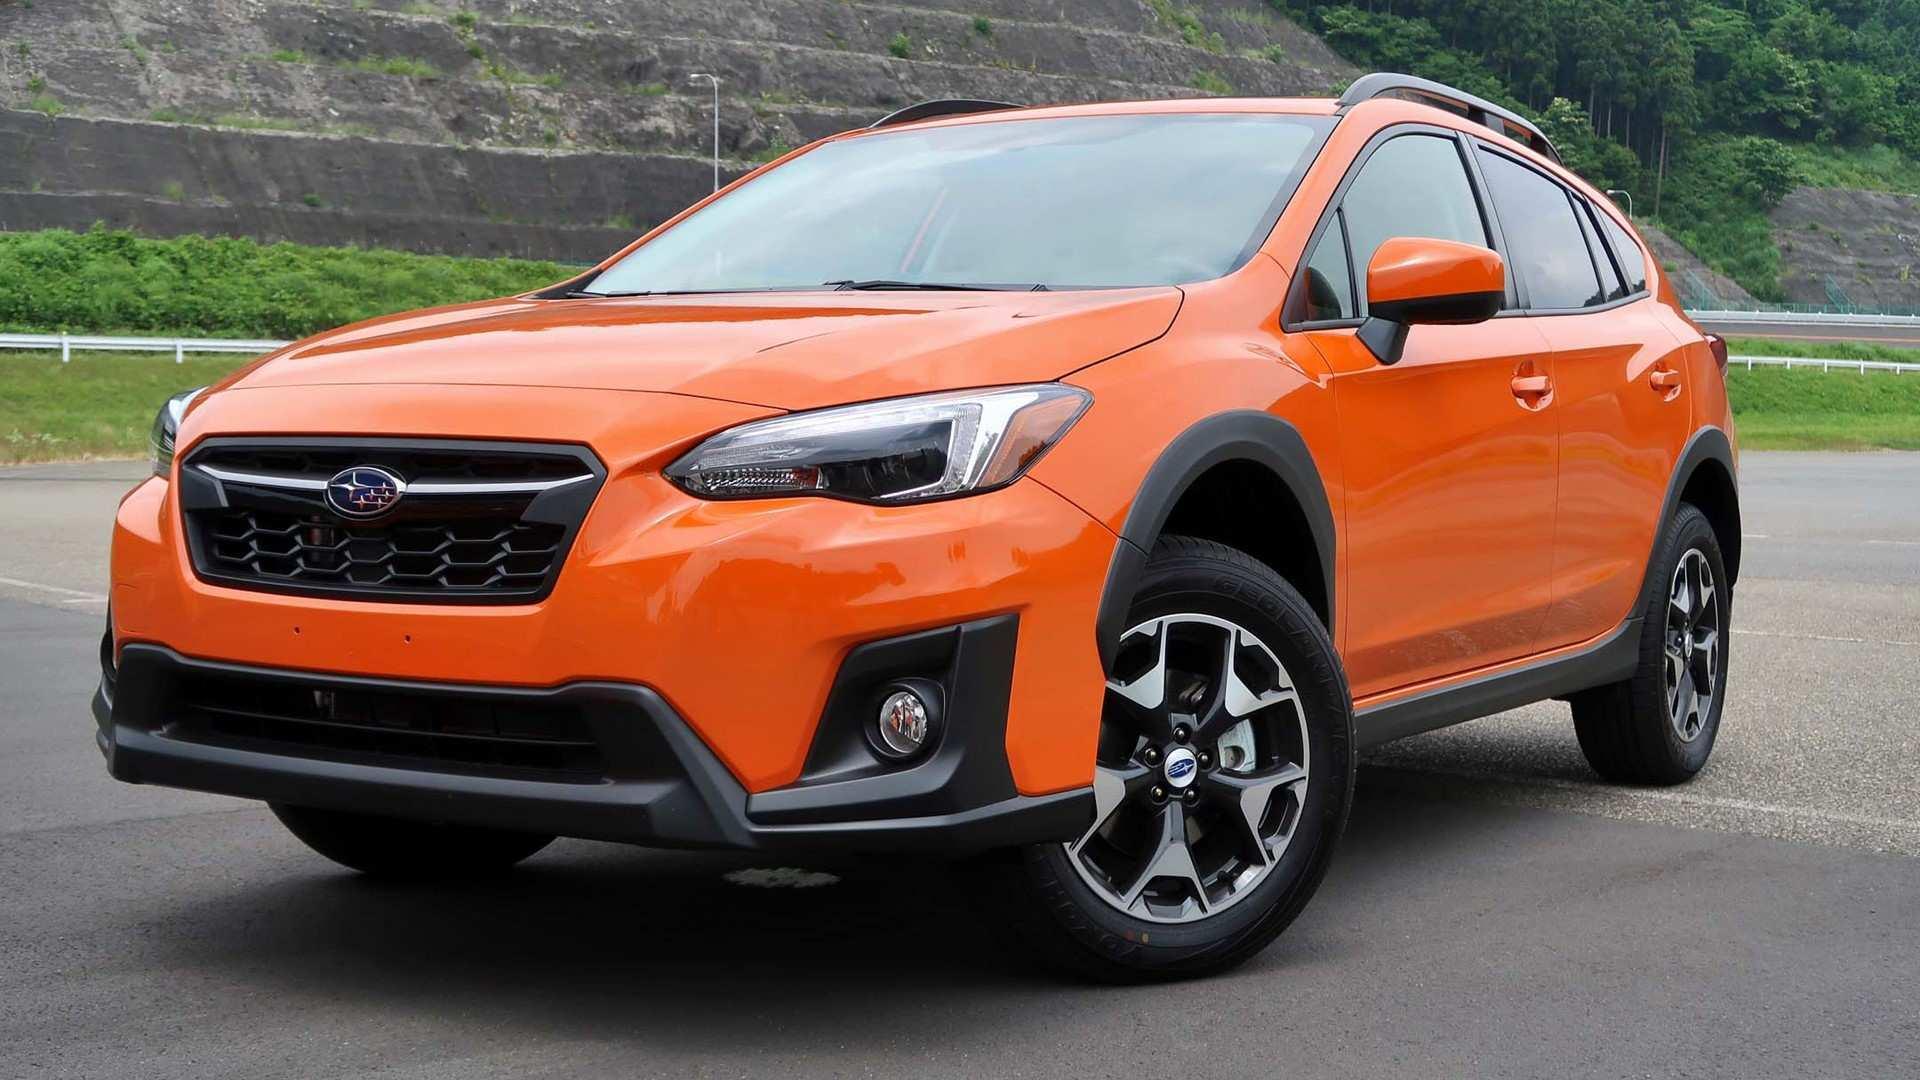 33 All New Subaru 2019 Crosstrek Hybrid Price And Release Date First Drive with Subaru 2019 Crosstrek Hybrid Price And Release Date